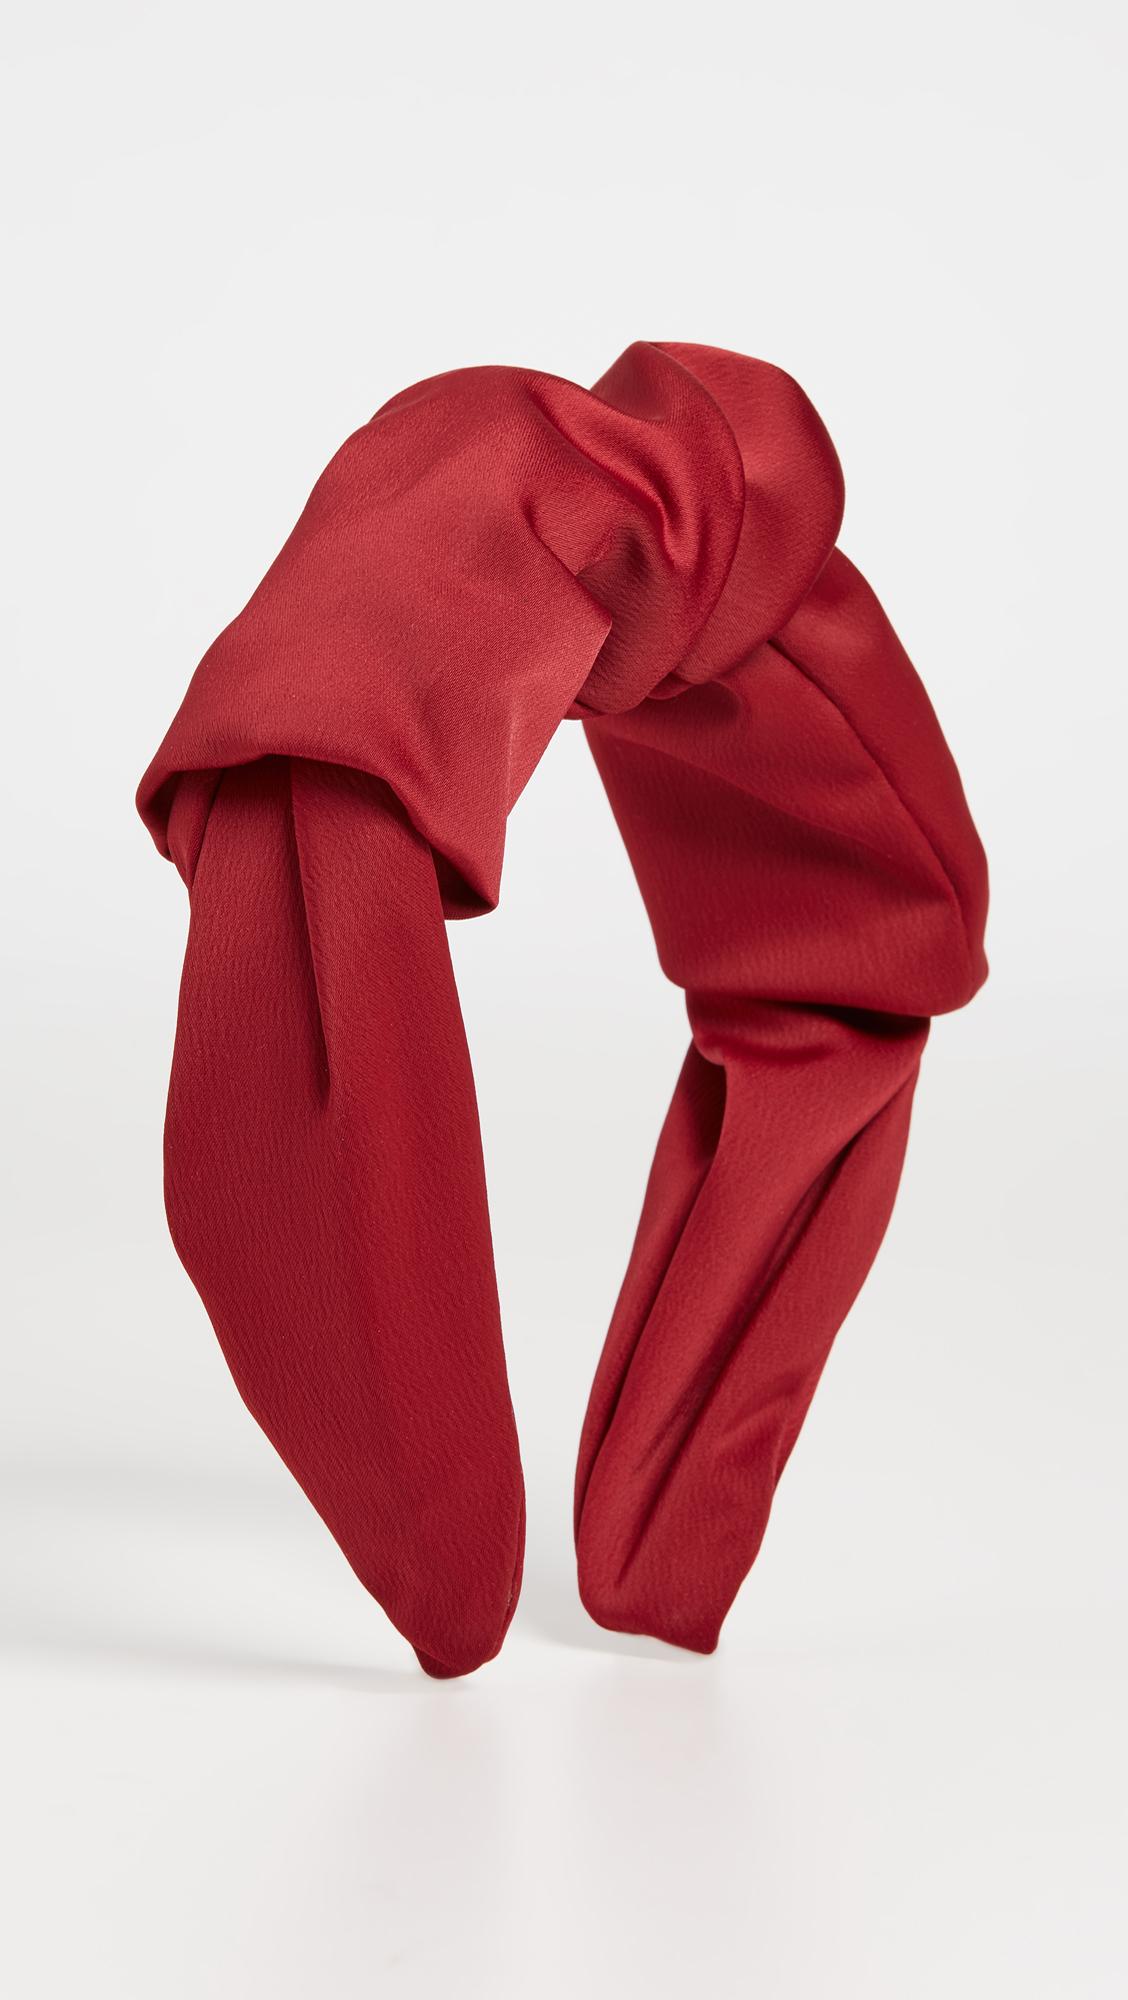 Inauguration Fashion 2021: Shashi red Caspian headband, $38